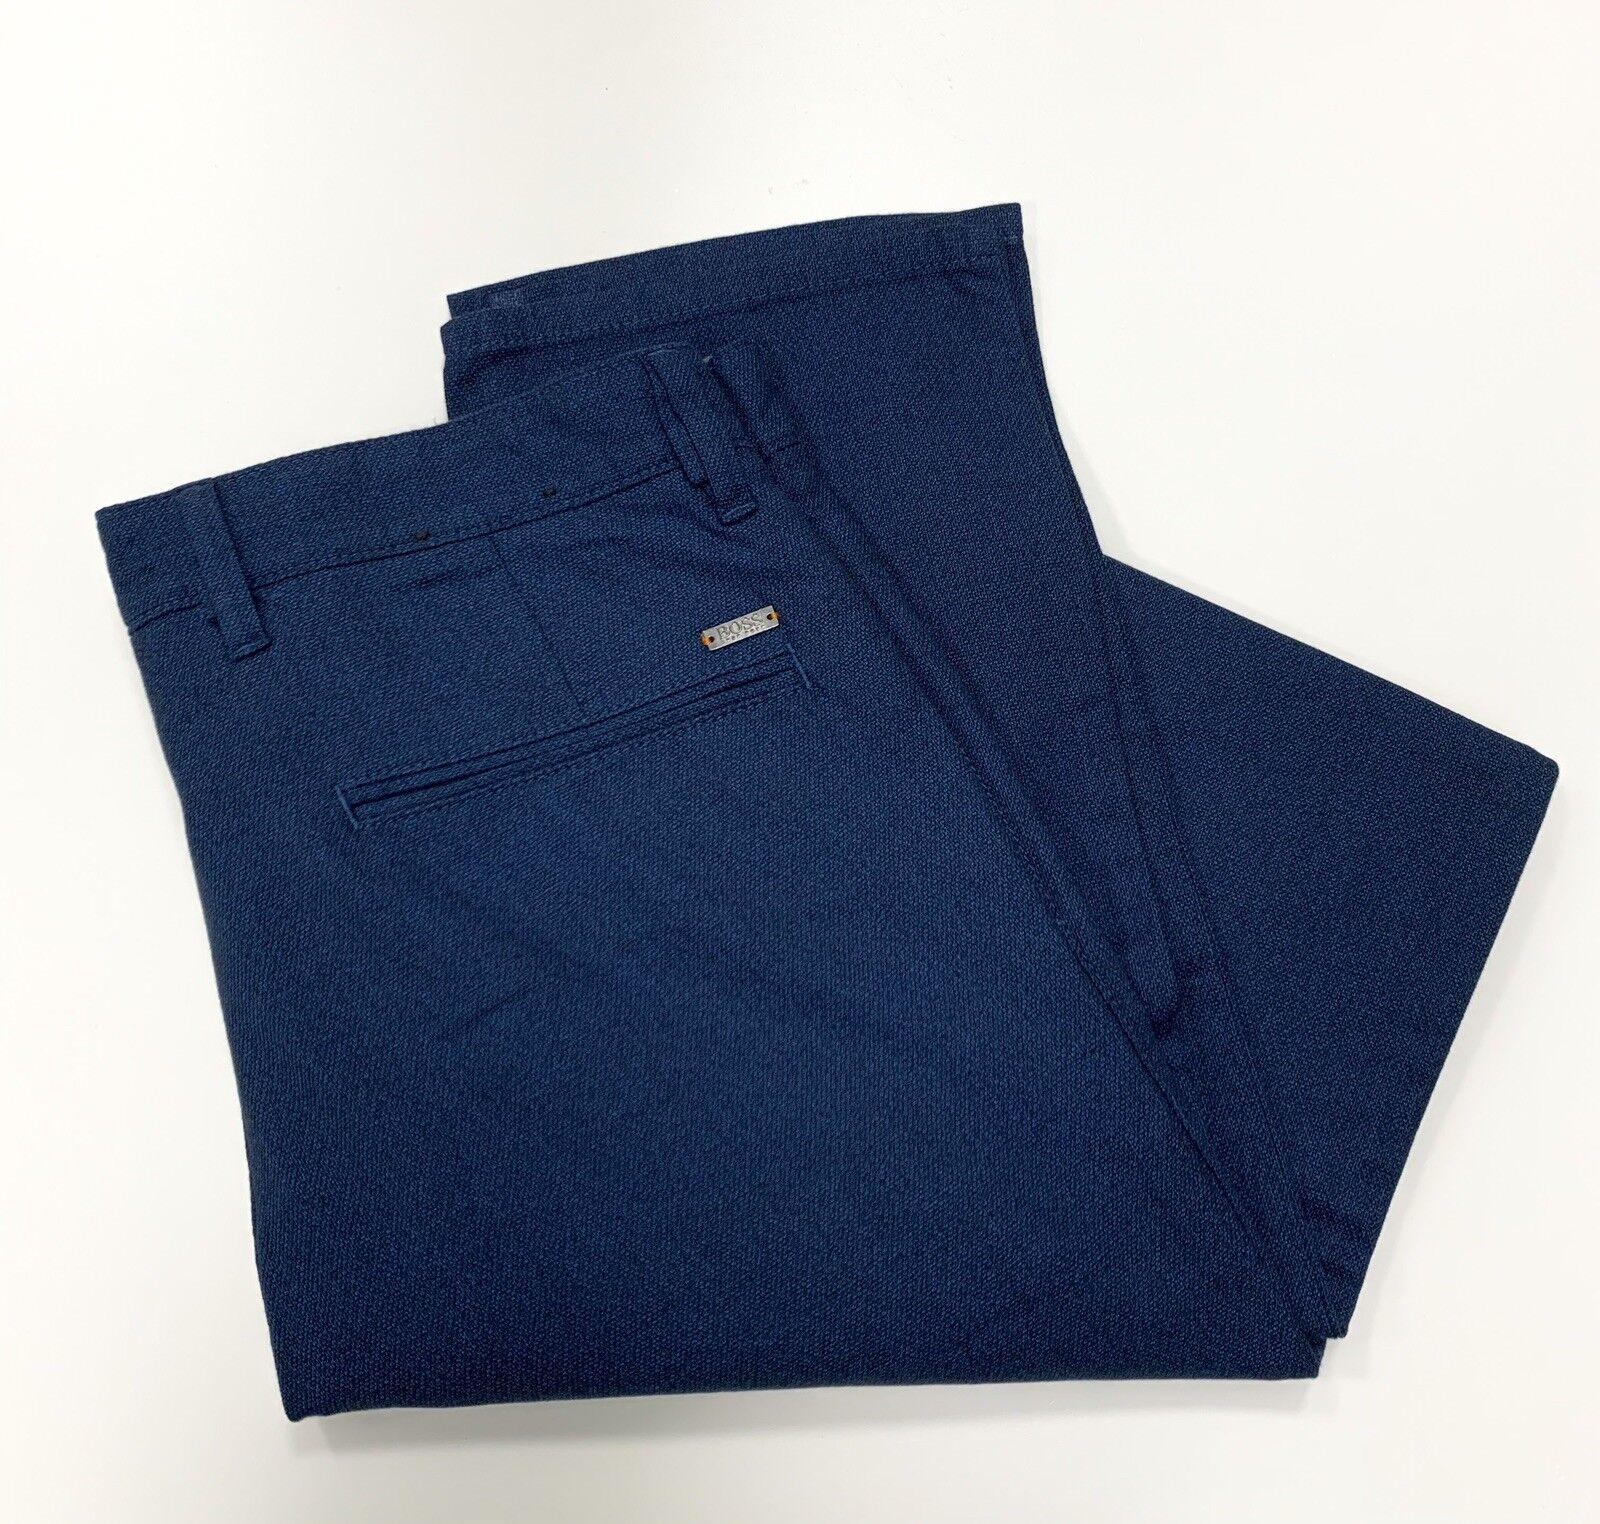 Hugo BOSS Pantaloni Slim Fit in un Sovratinti Sovratinti Sovratinti melange blu scuro cotone stretch 700a76